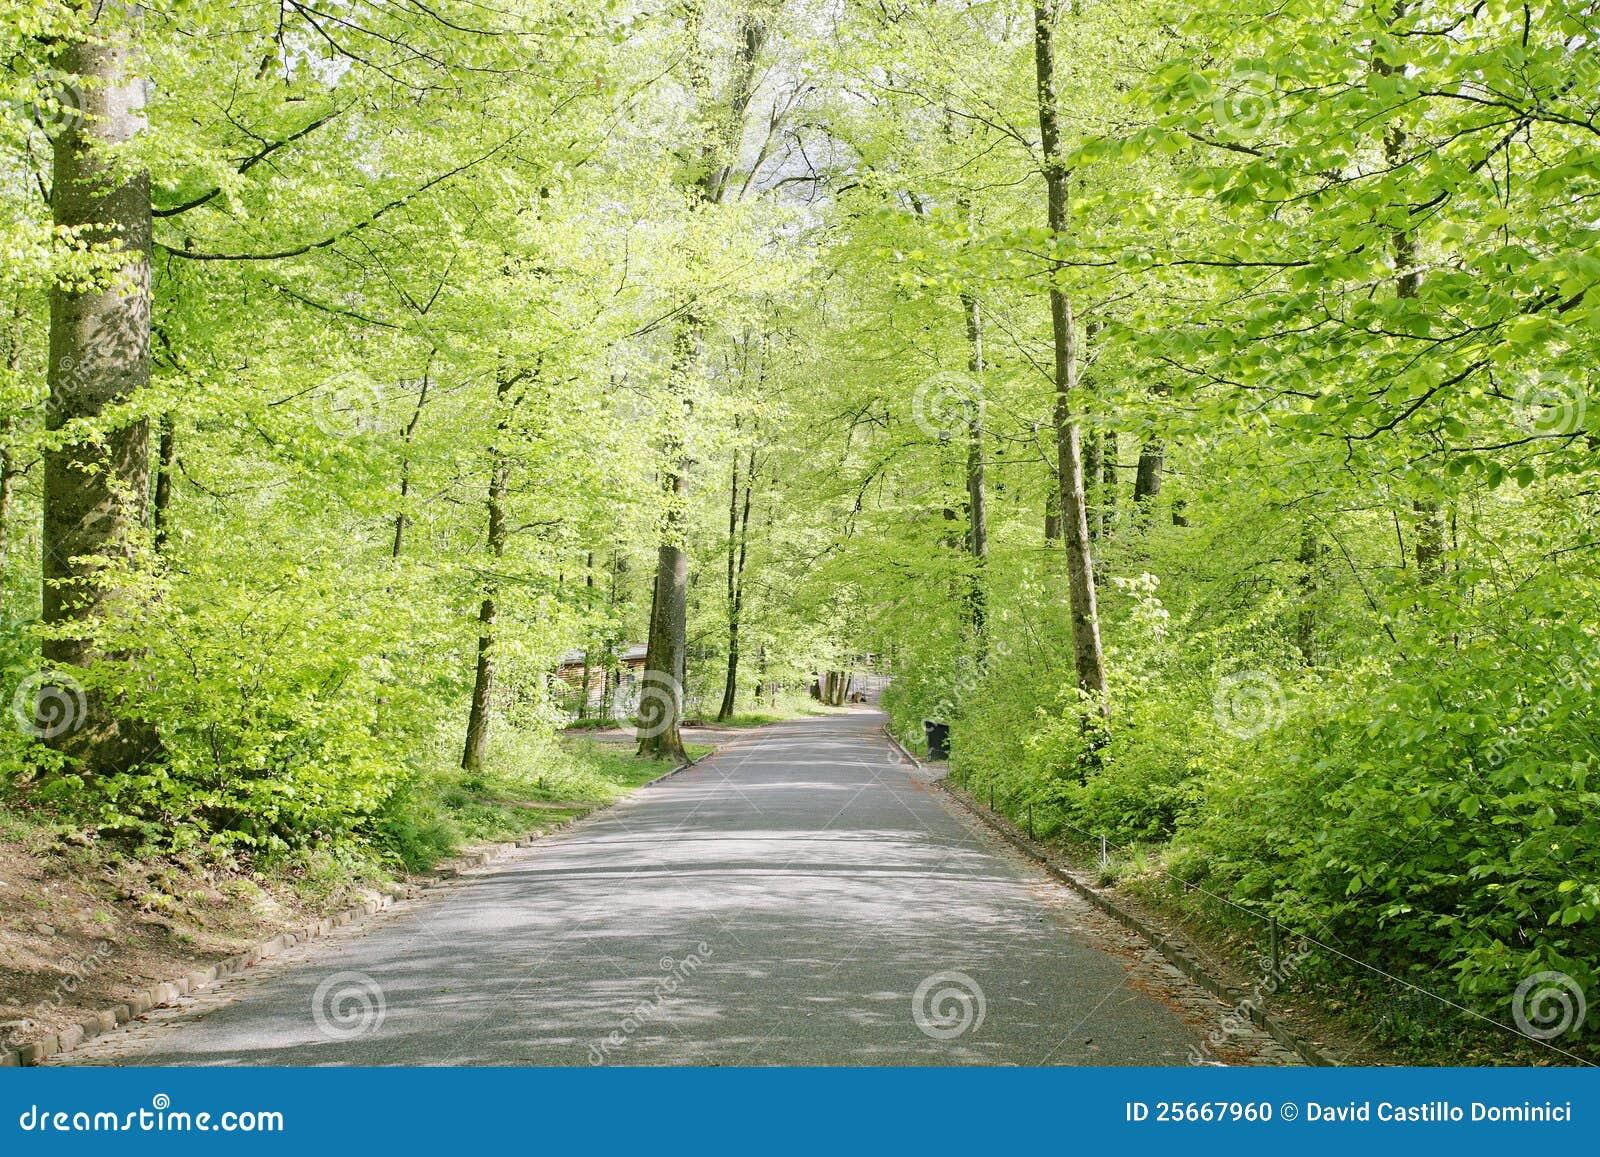 Roads of a beautifull swiss park stock photo image